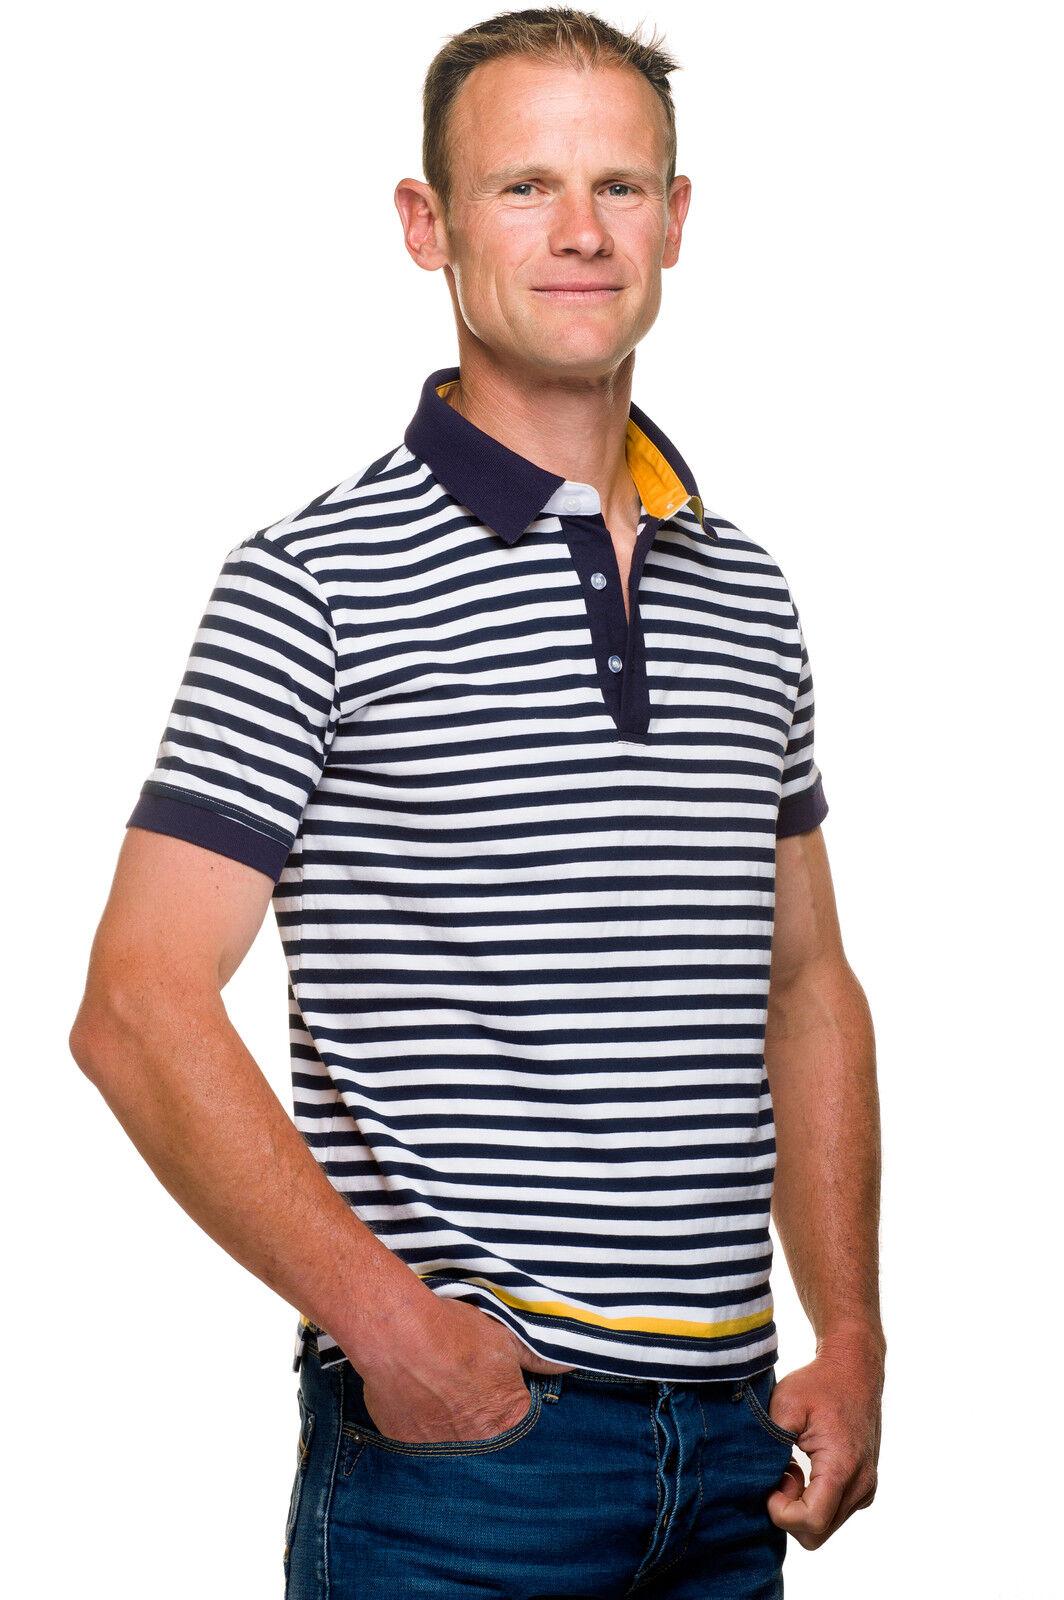 Ugholin Herren Poloshirt Gestreiftes Marine Baumwolle Polohemd Kurzarm